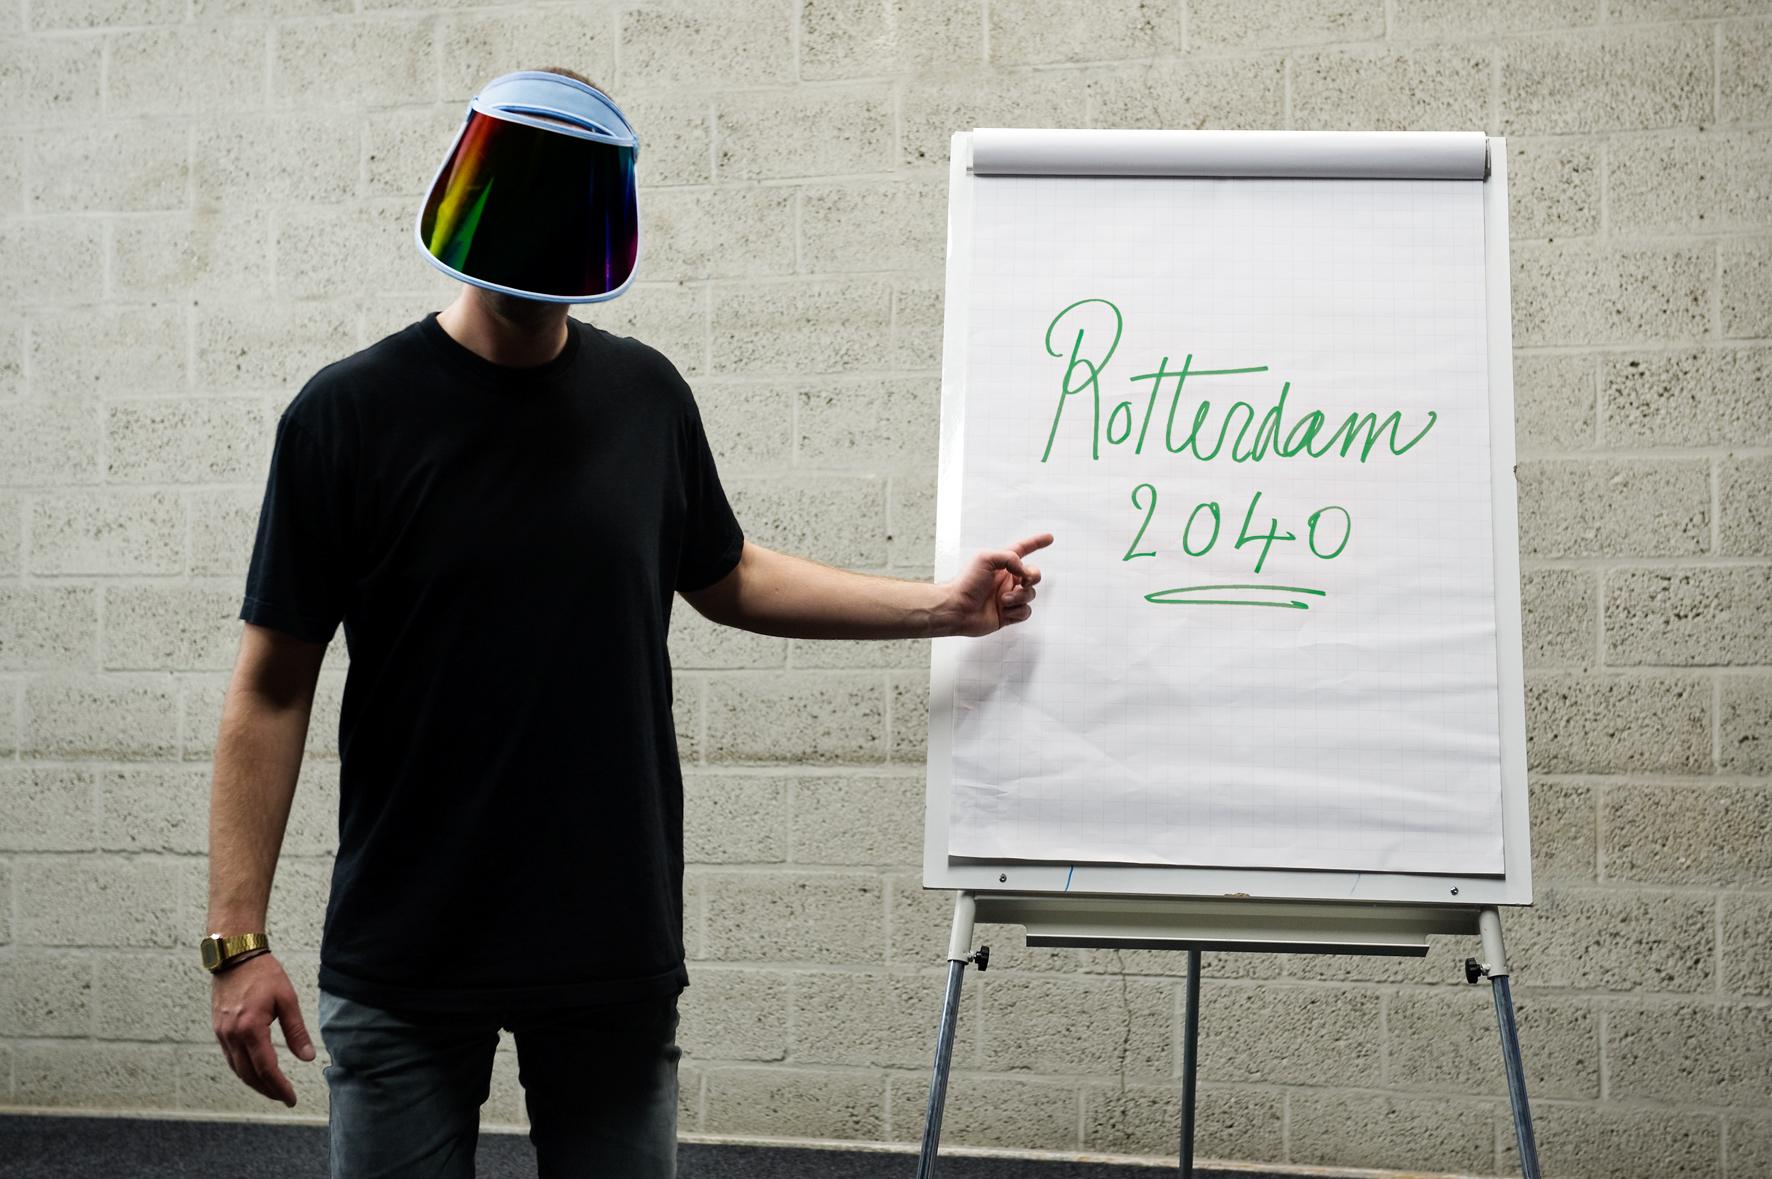 Rotterdam2040_Pers